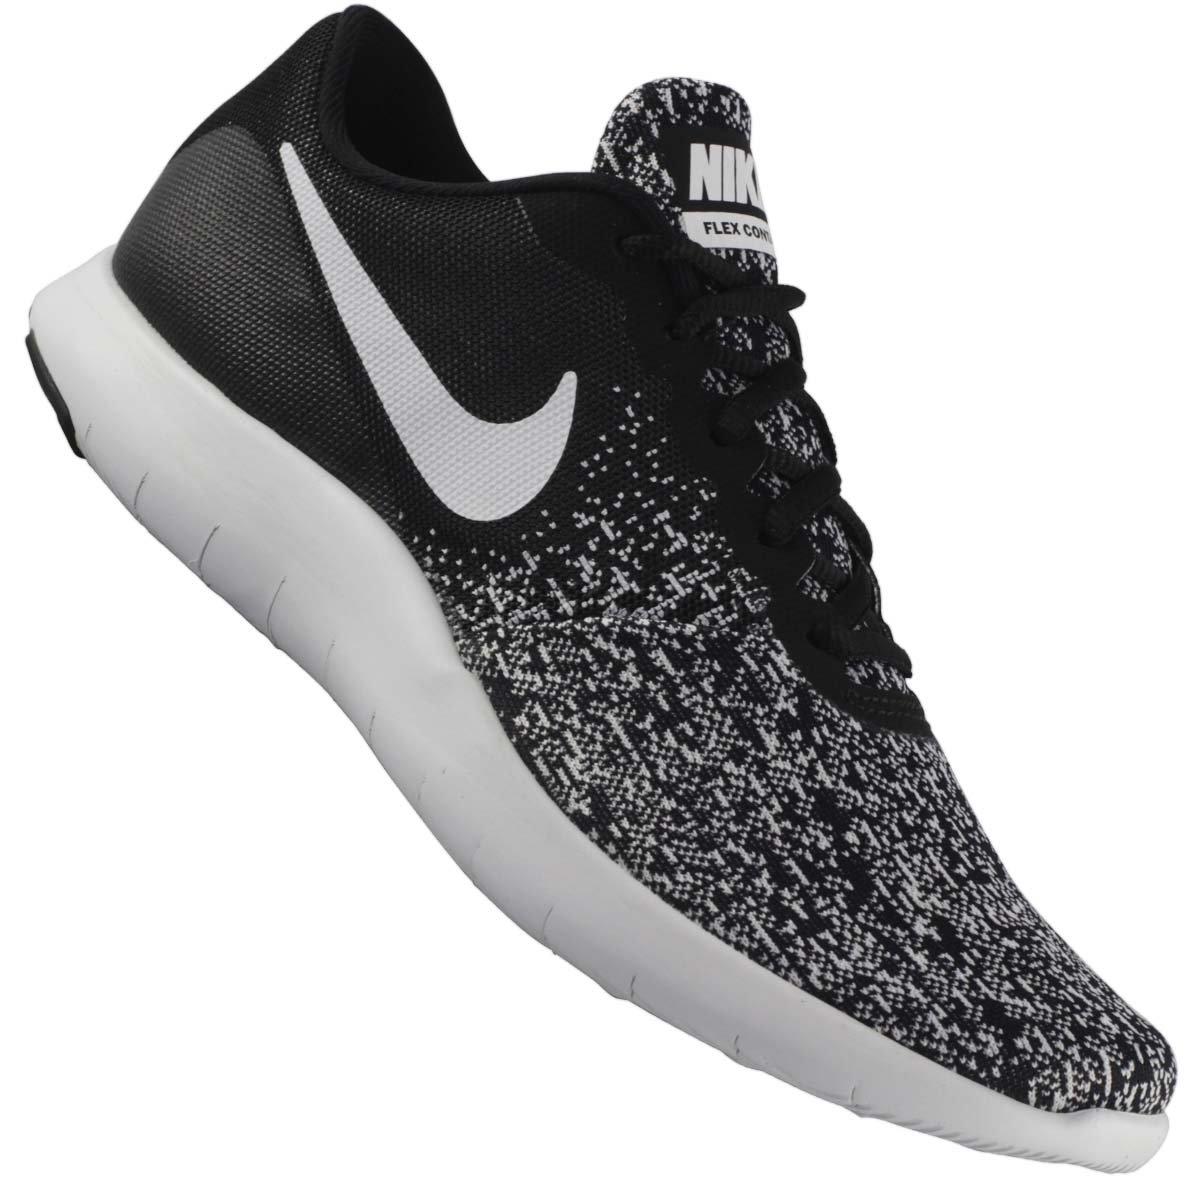 6ebde069f Tênis Nike Wmns Flex Contact Feminino